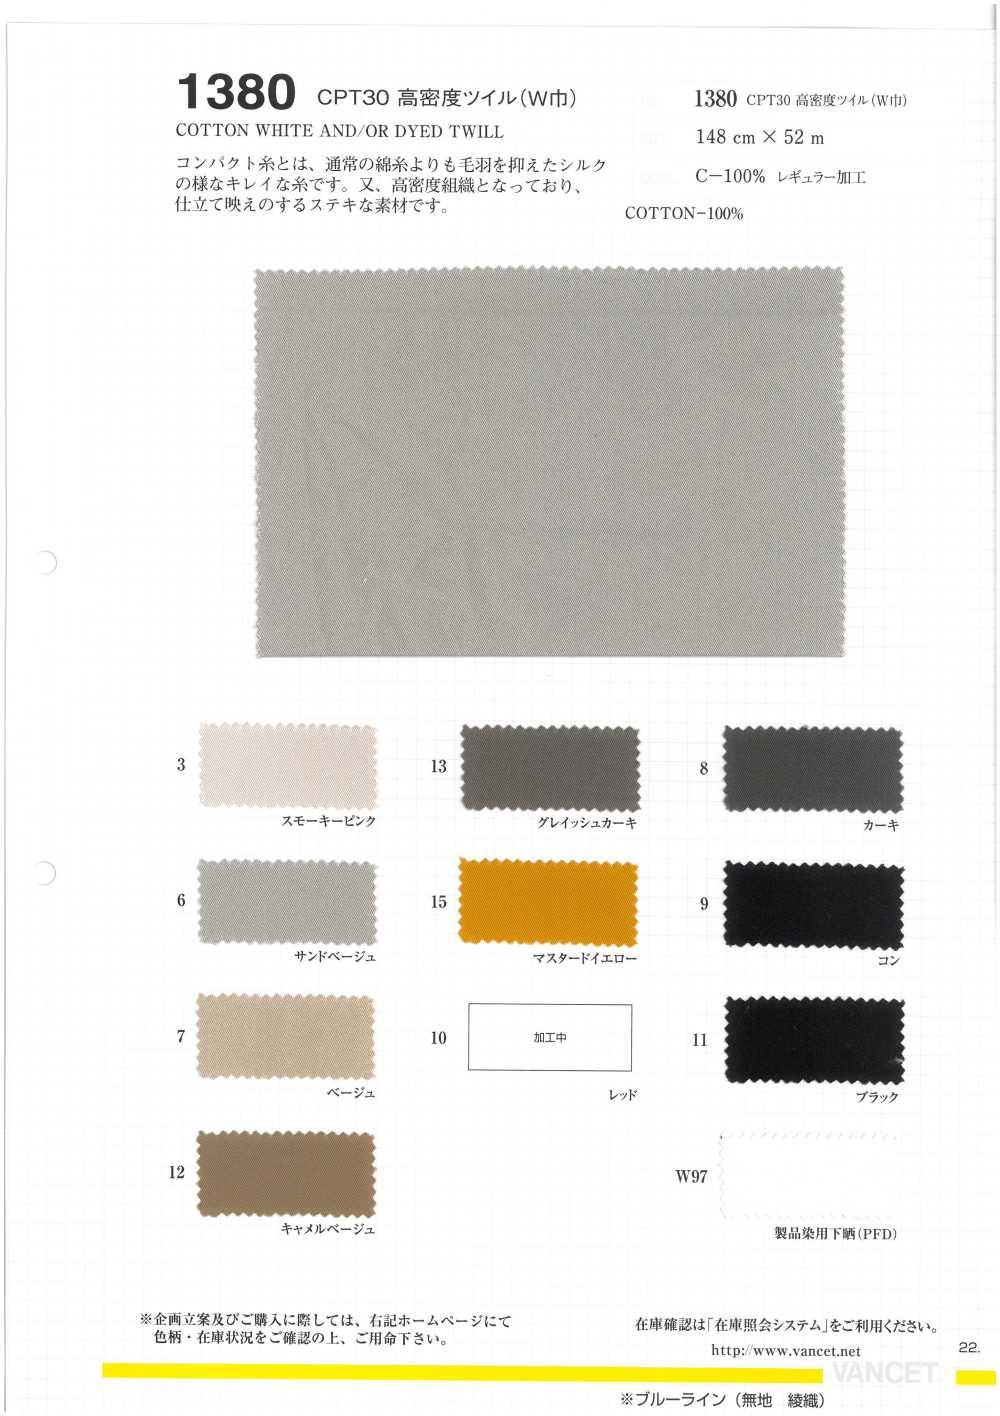 1380 CPT30高密度バーバーリー(W巾)[生地] VANCET/オークラ商事 - ApparelX アパレル資材卸通販